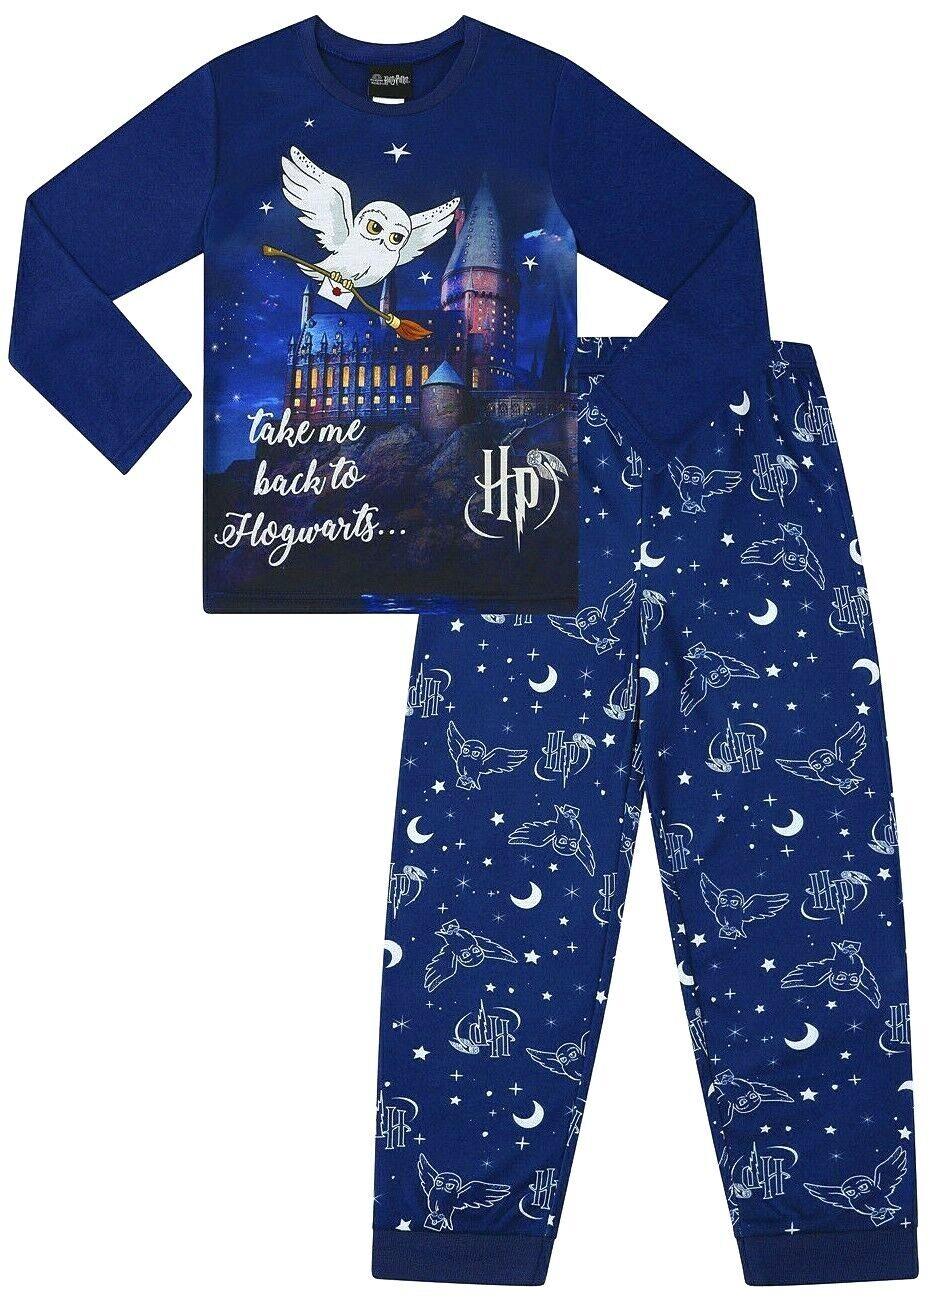 Boys Girls size 7 HARRY POTTER Flannel Burgundy flannelette pyjamas pjs NEW